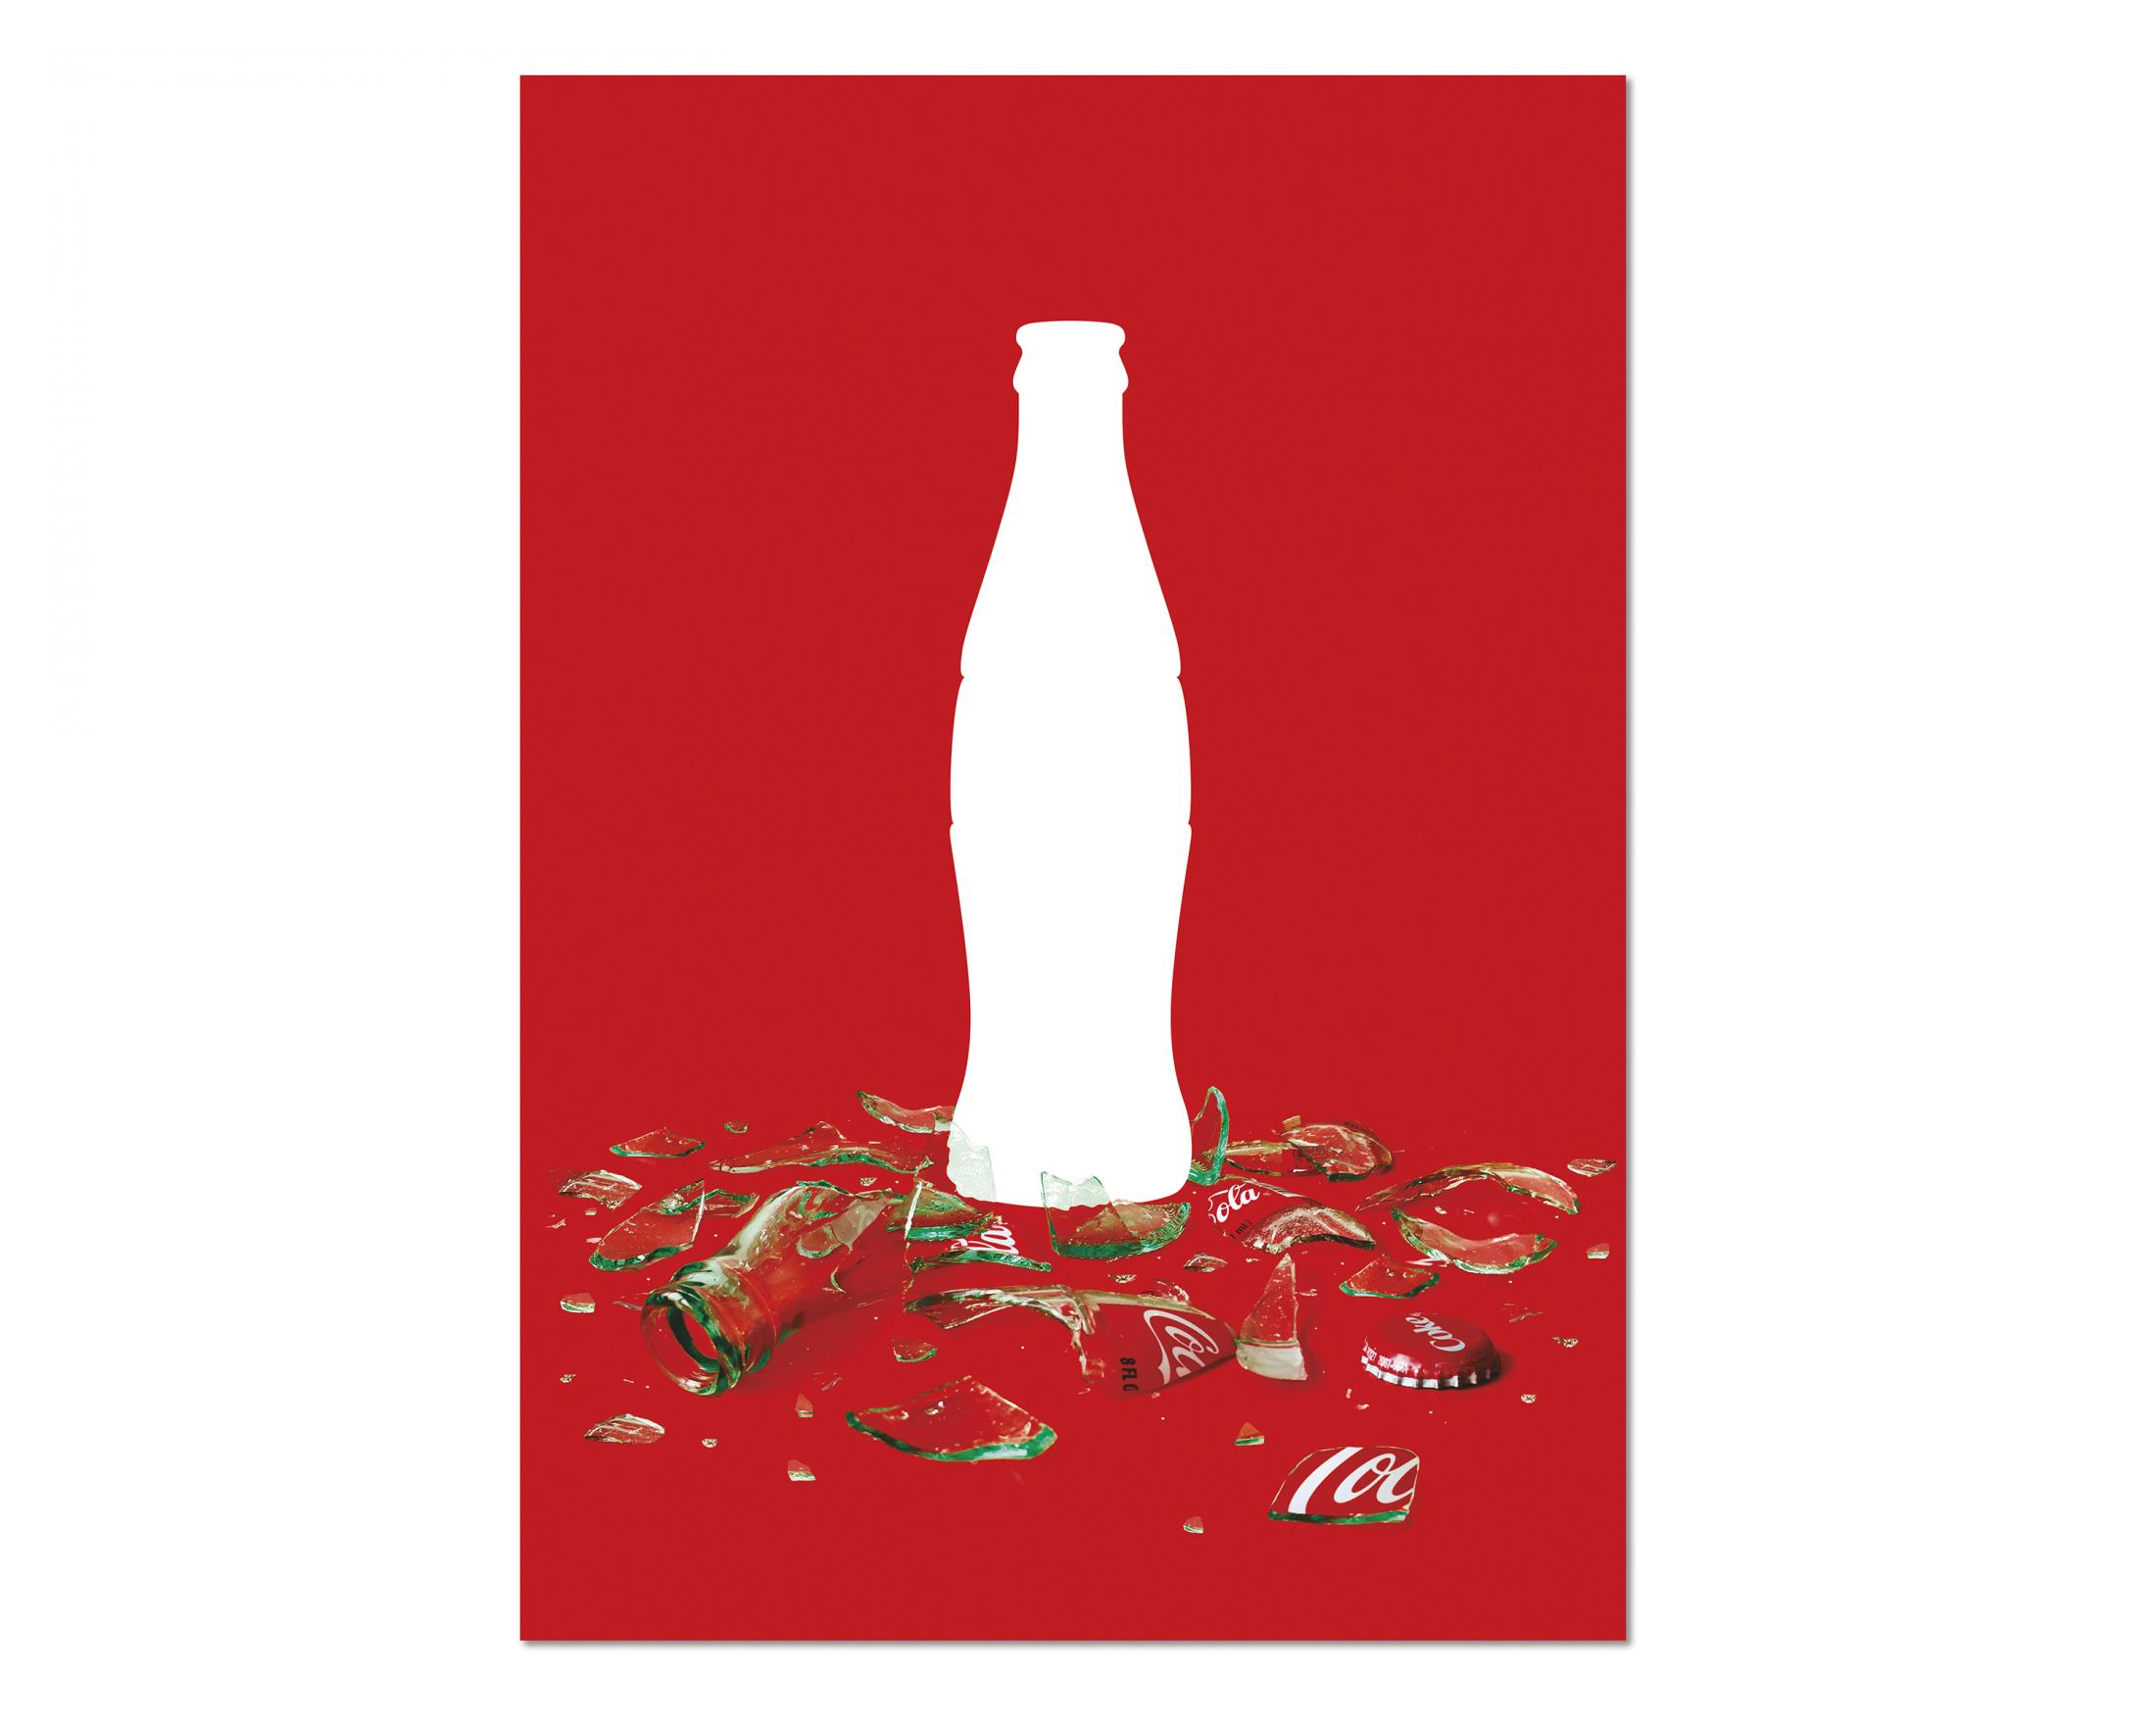 Thumbnail for Coca-Cola 100 contour posters